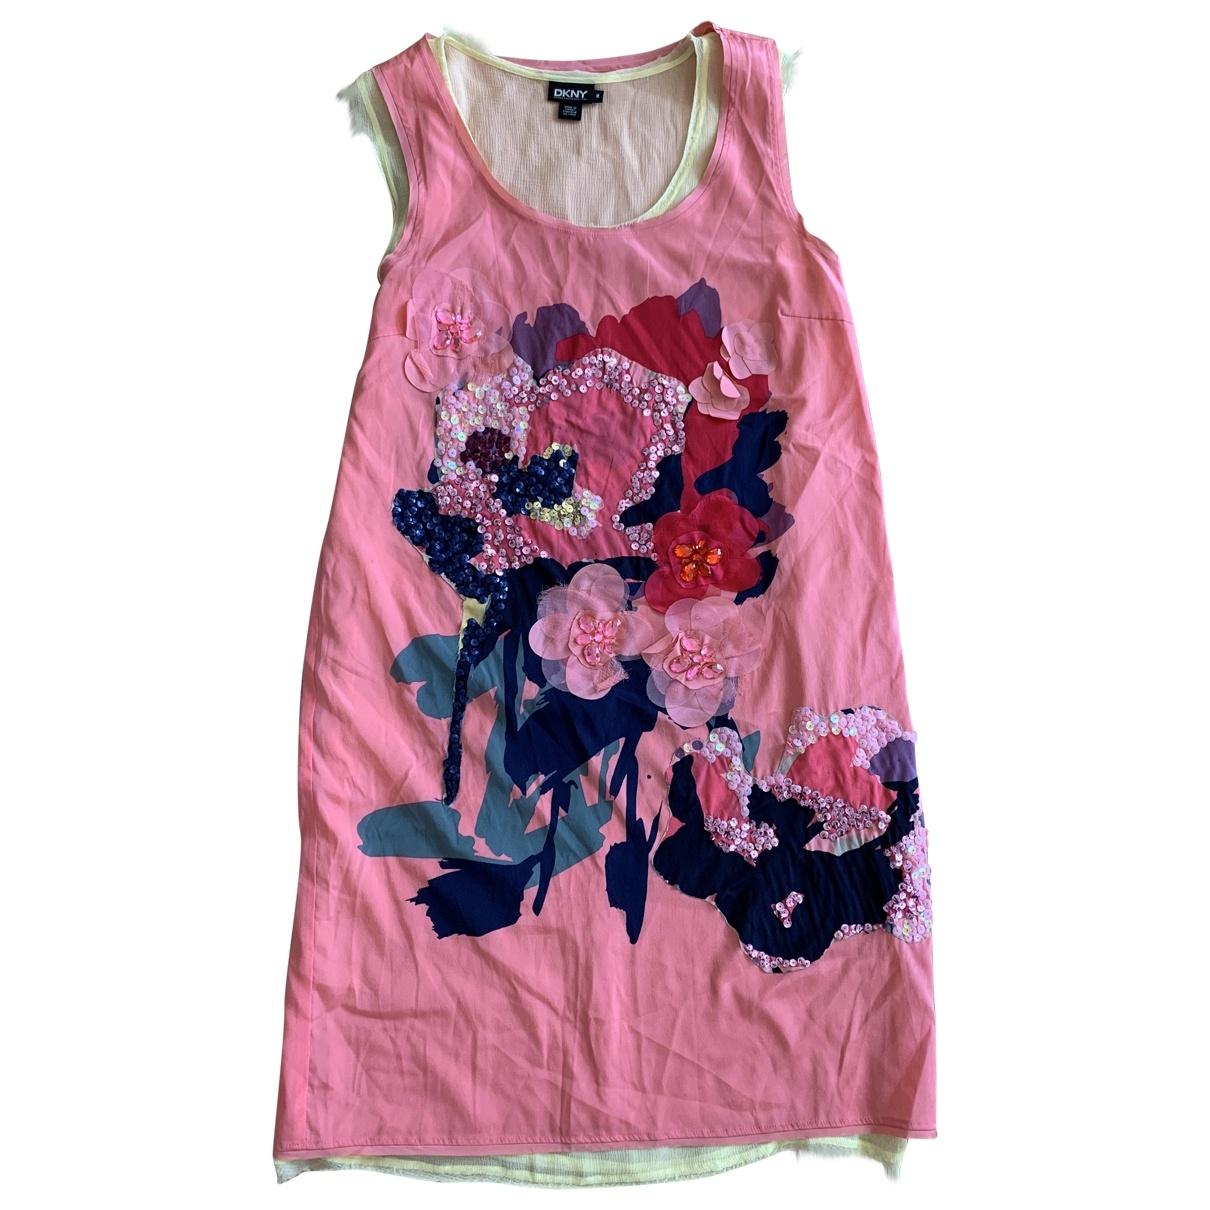 Dkny \N Multicolour Cotton dress for Women 40 FR